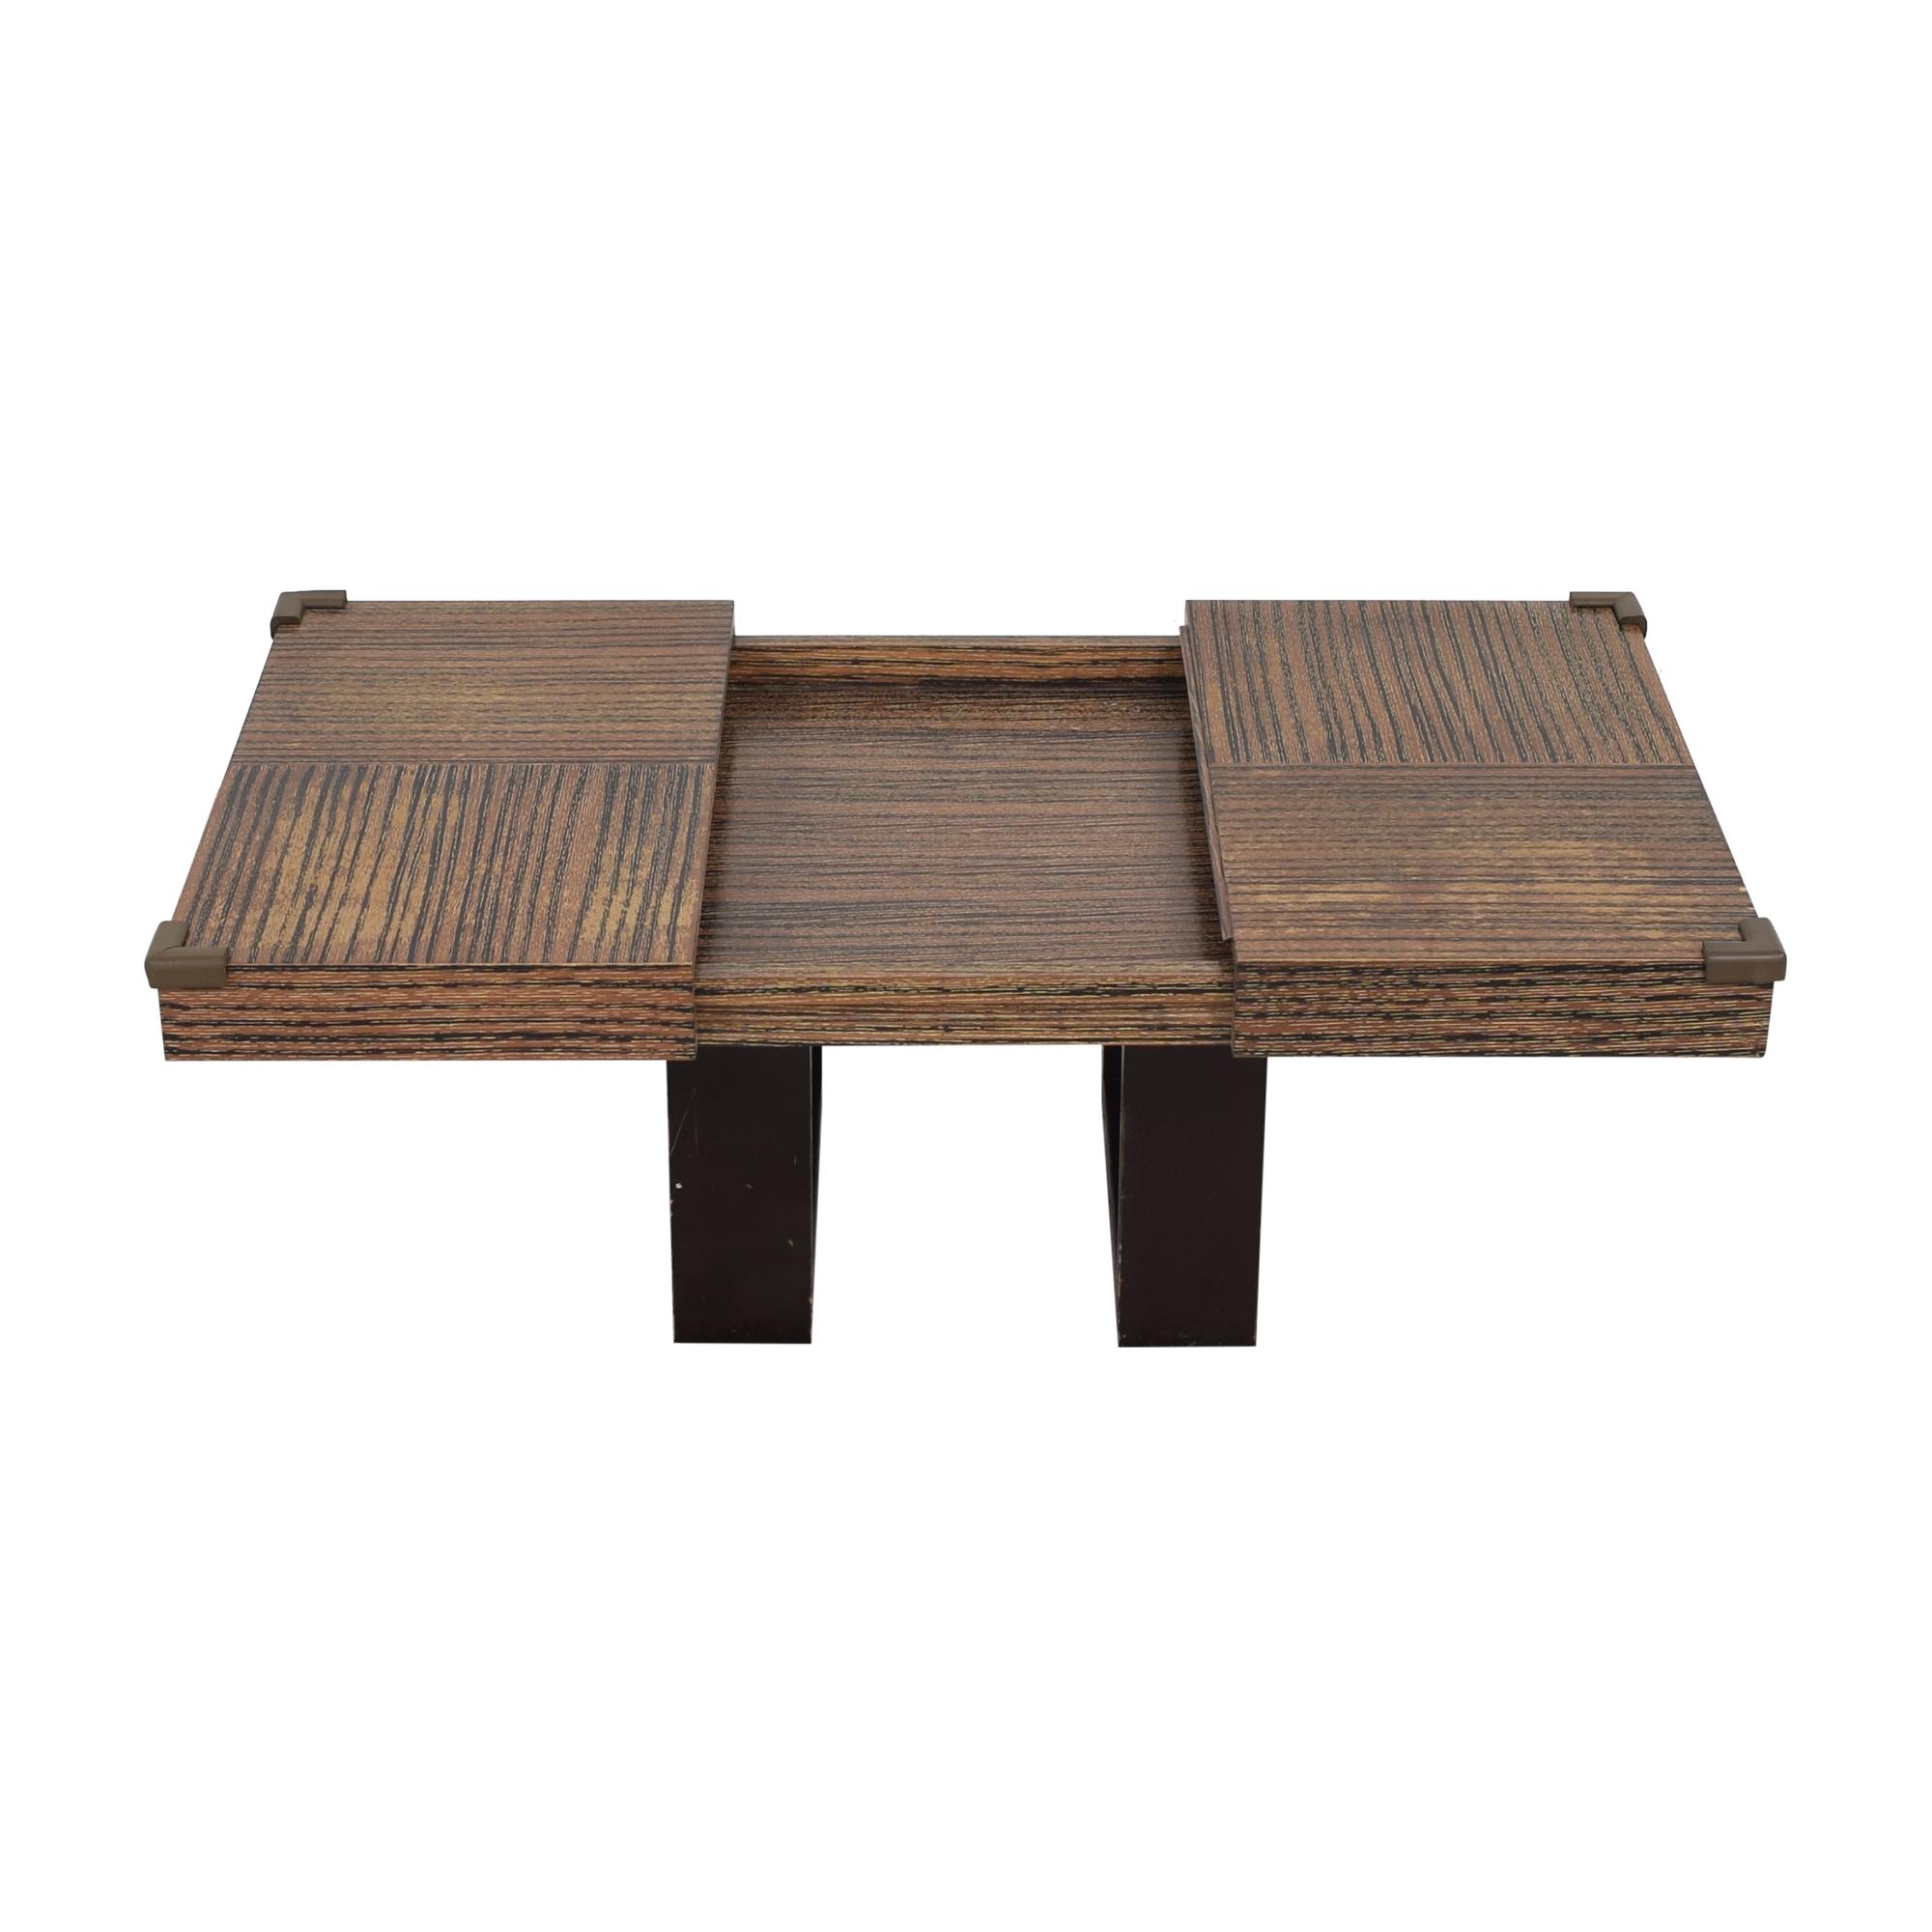 Michael Berman Limited Michael Berman Limited Trousdale Coffee Table on sale